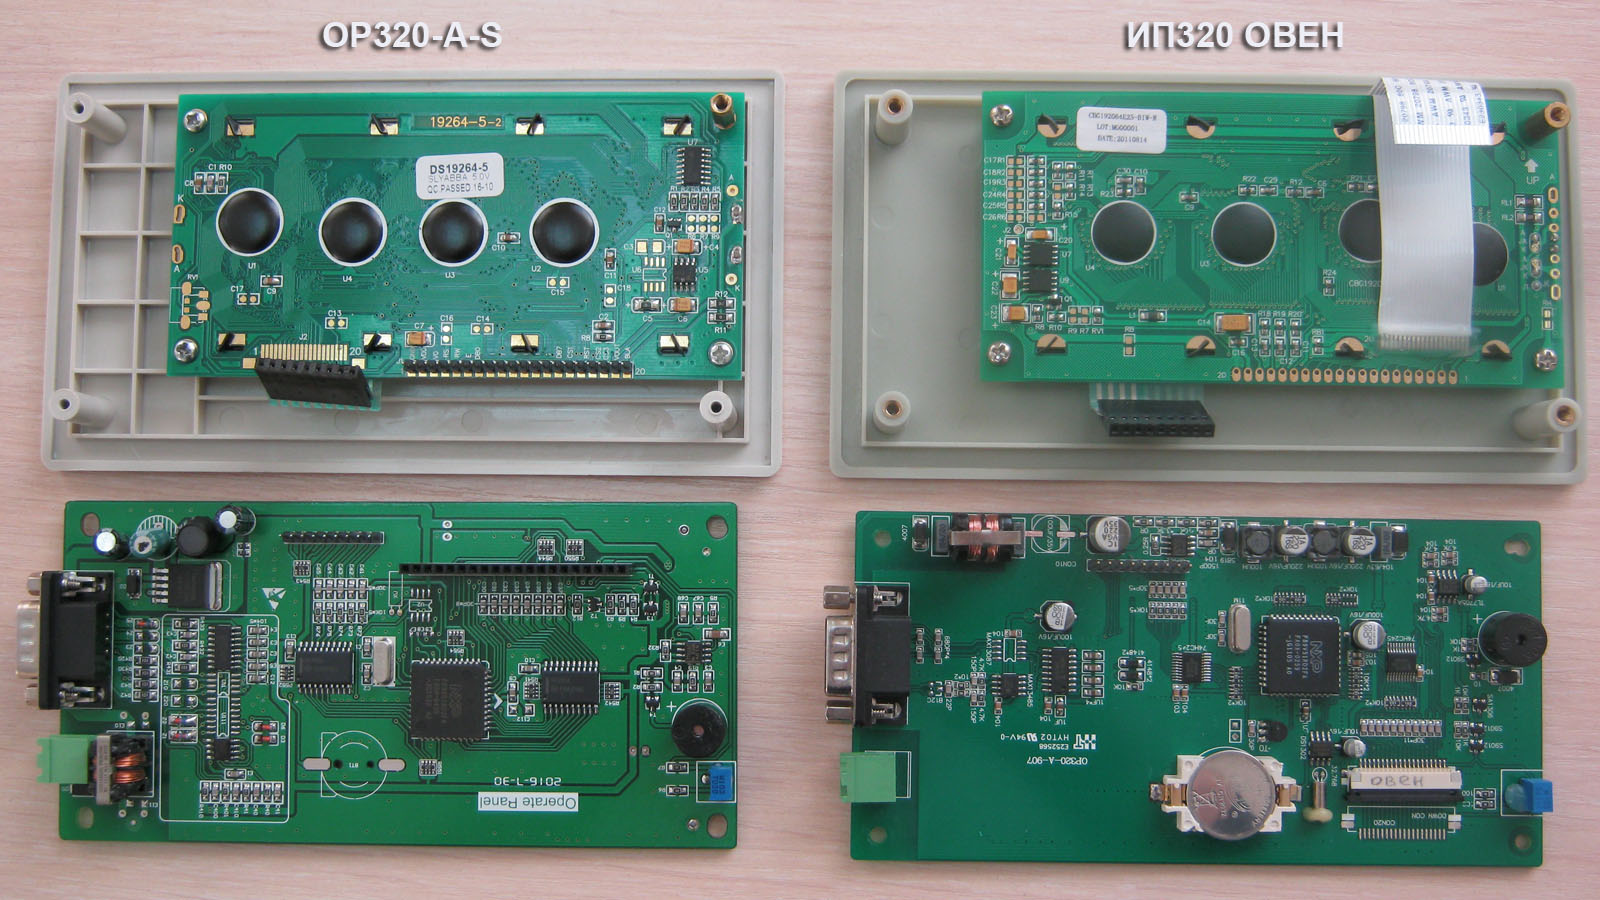 Рис. 16 — Платы OP320-A-S и ИП320